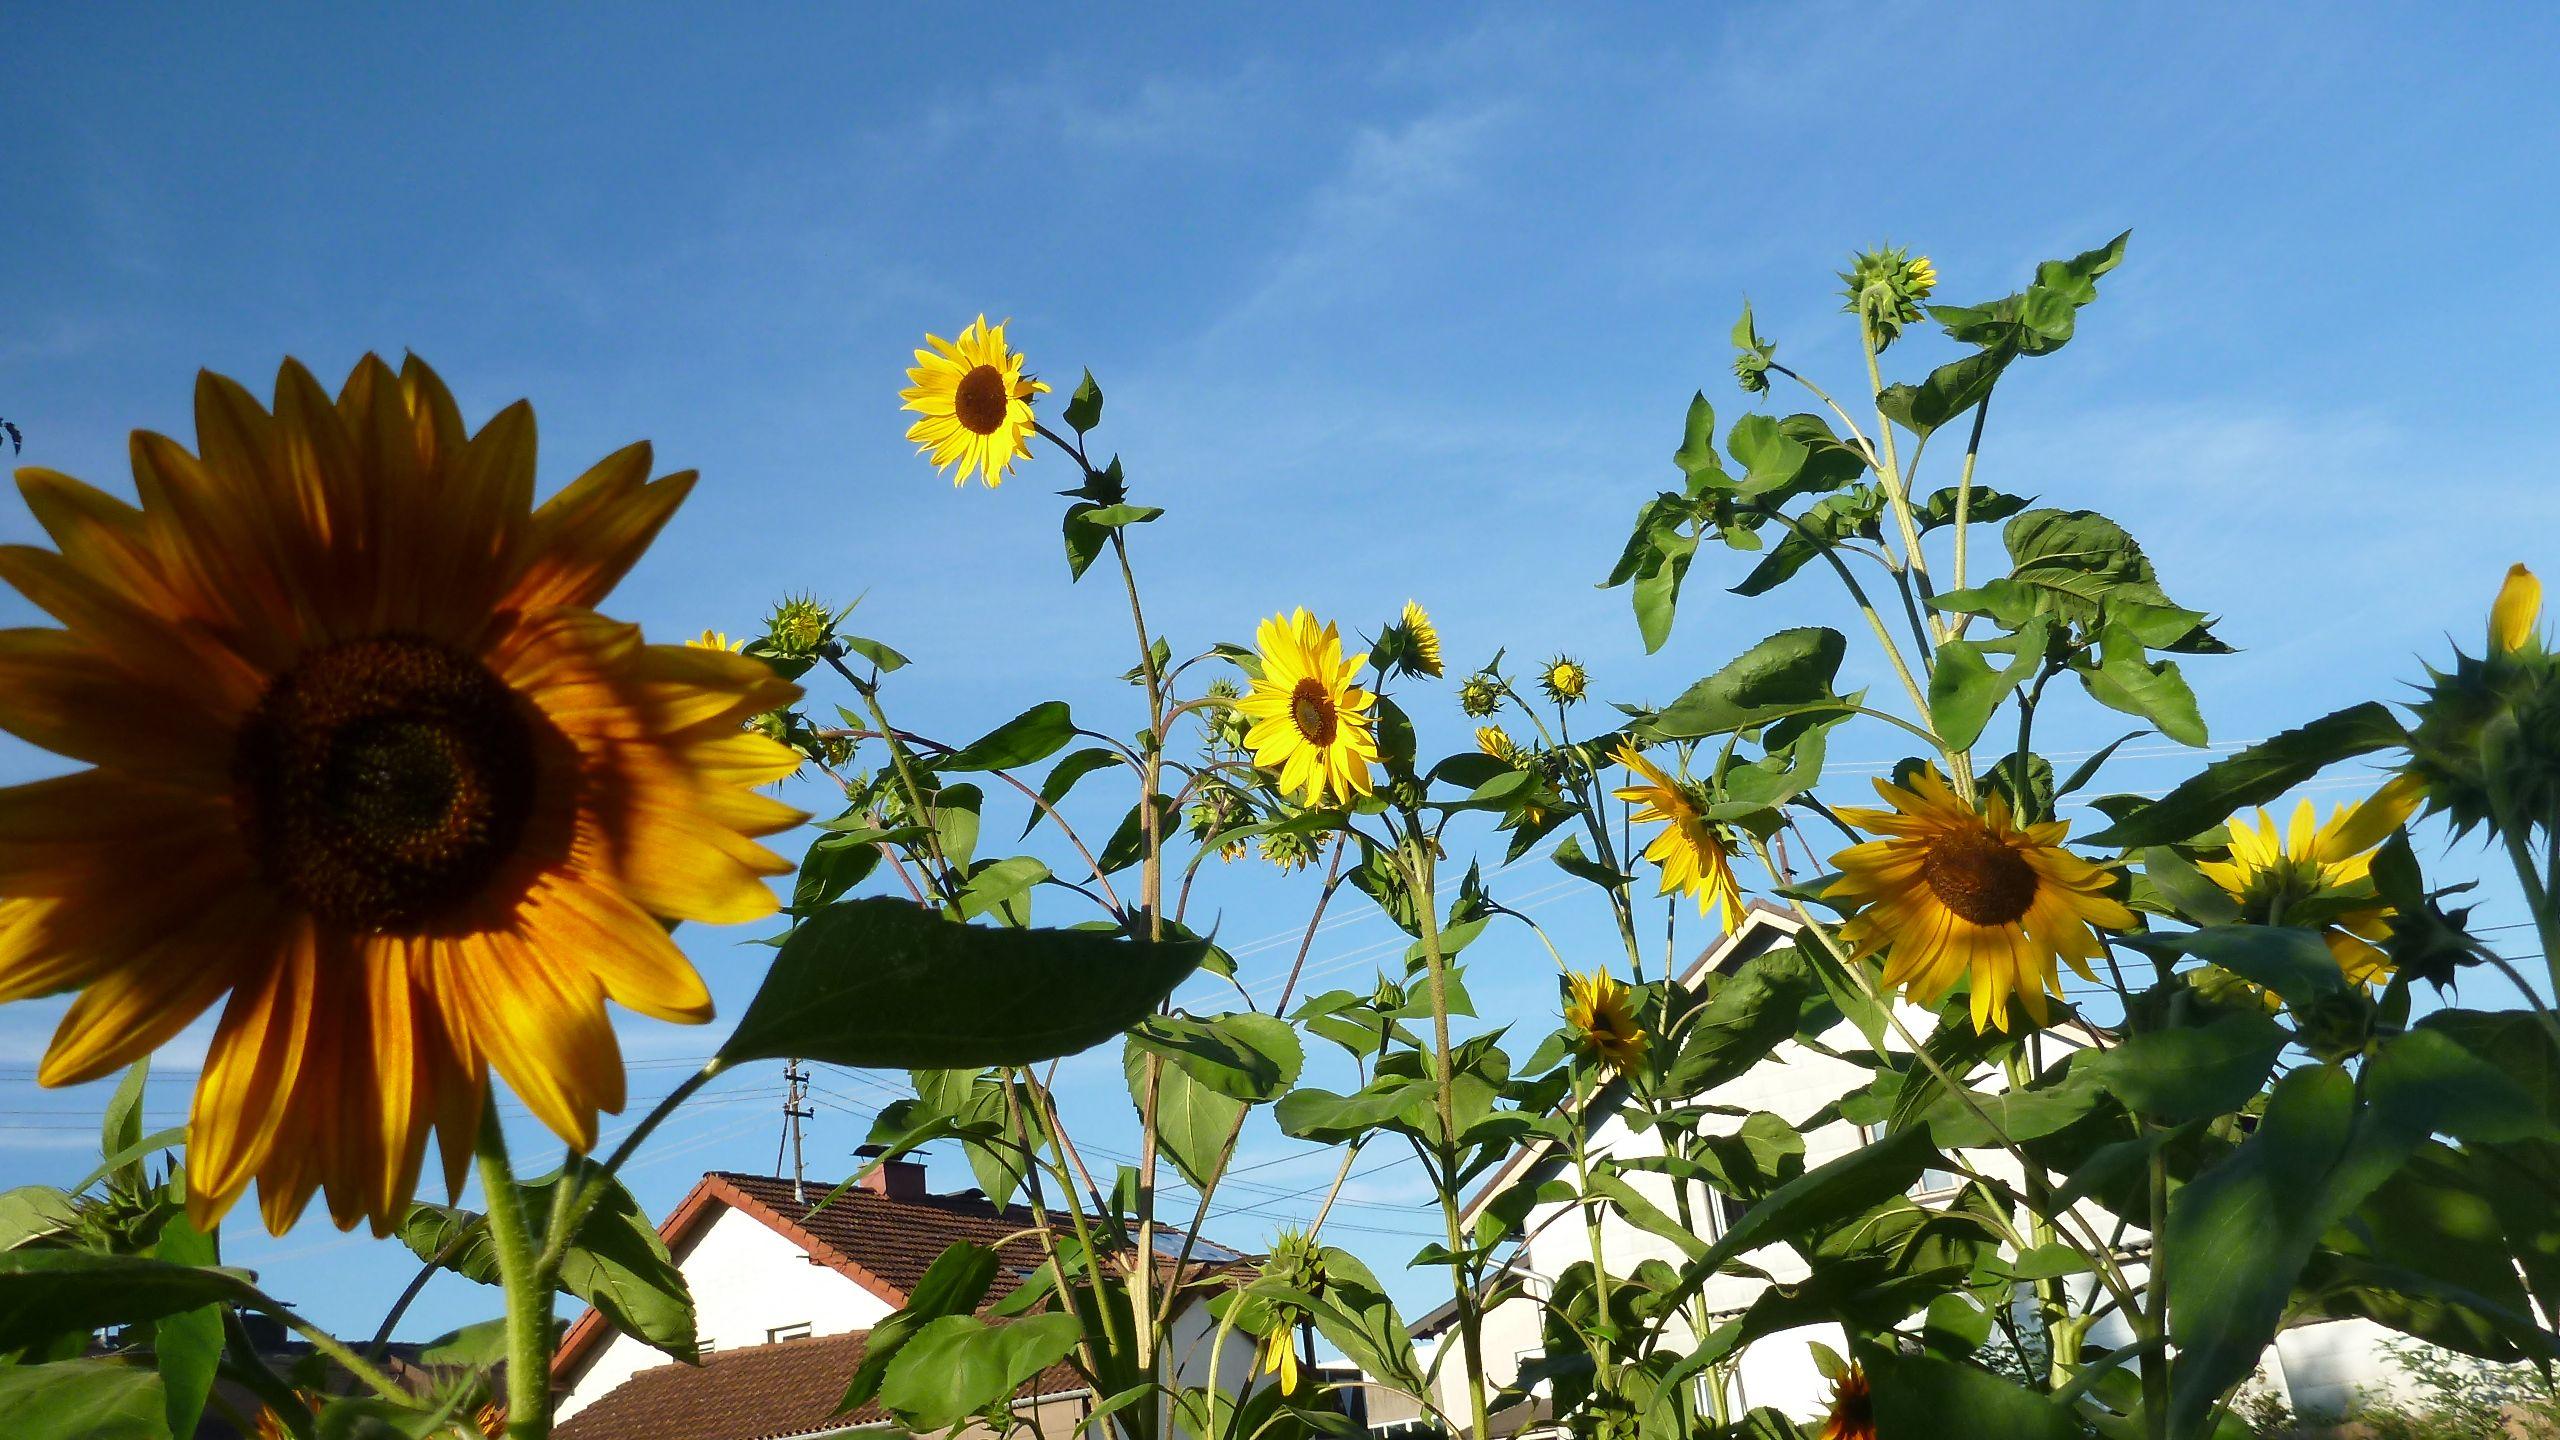 3m hohe Sonnenblumen